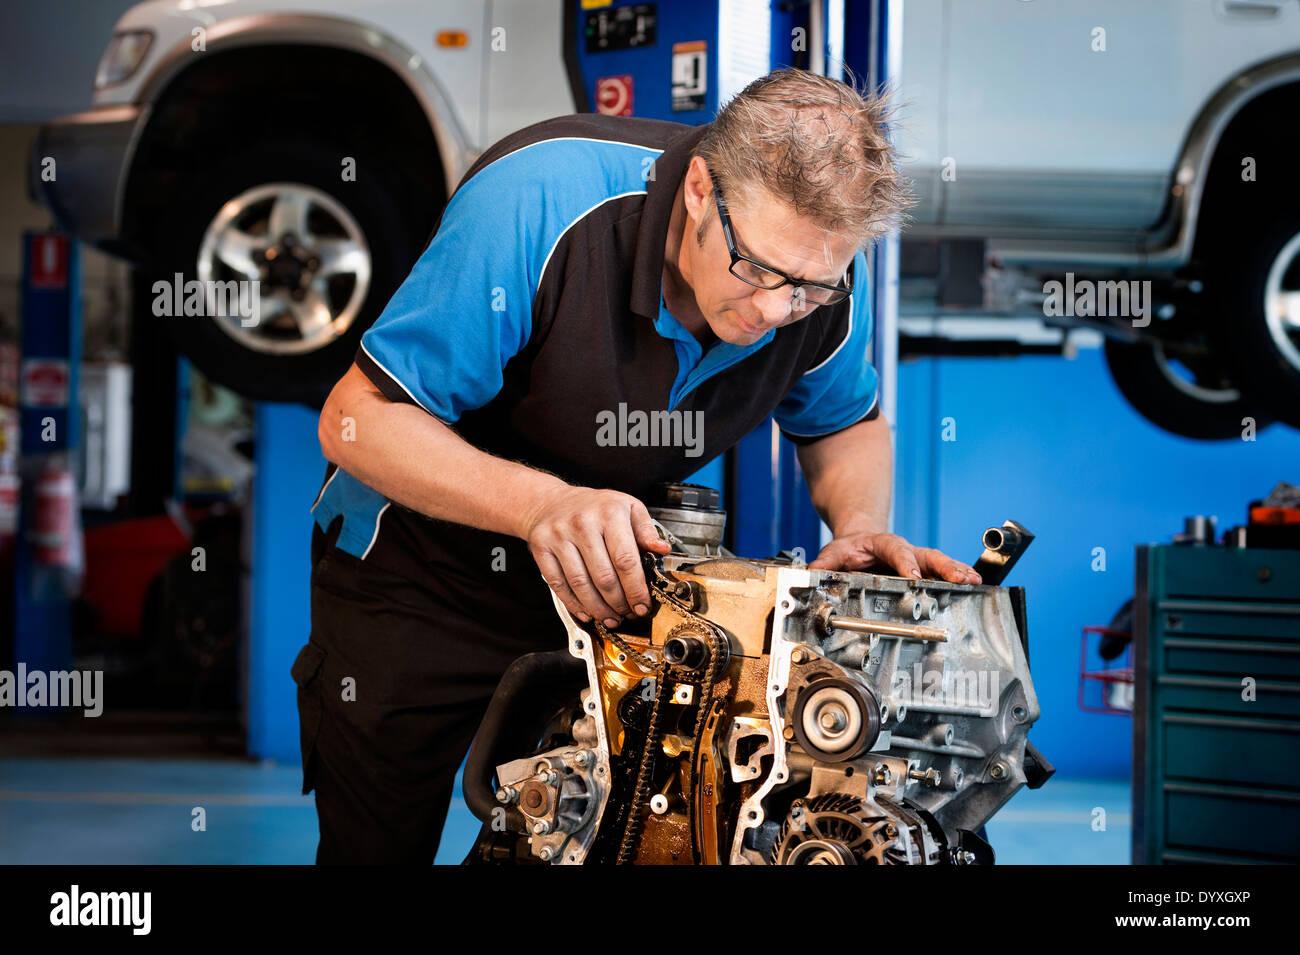 Mechaniker arbeiten an einem Automotor Stockbild